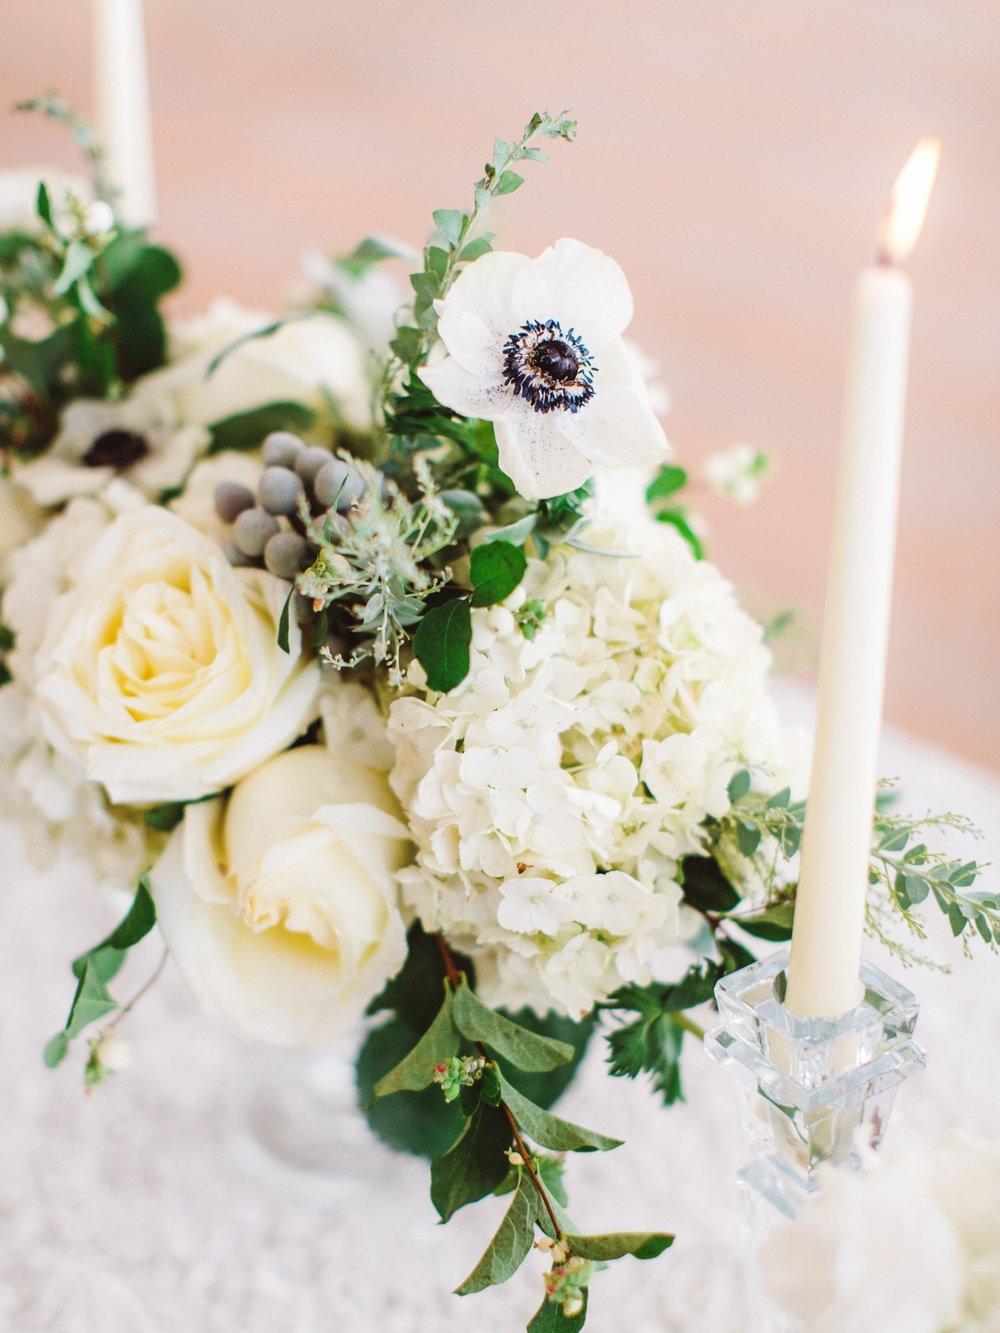 Anna-Delores-photography-Wedding-Flowers-WEB-REZ-26.jpg